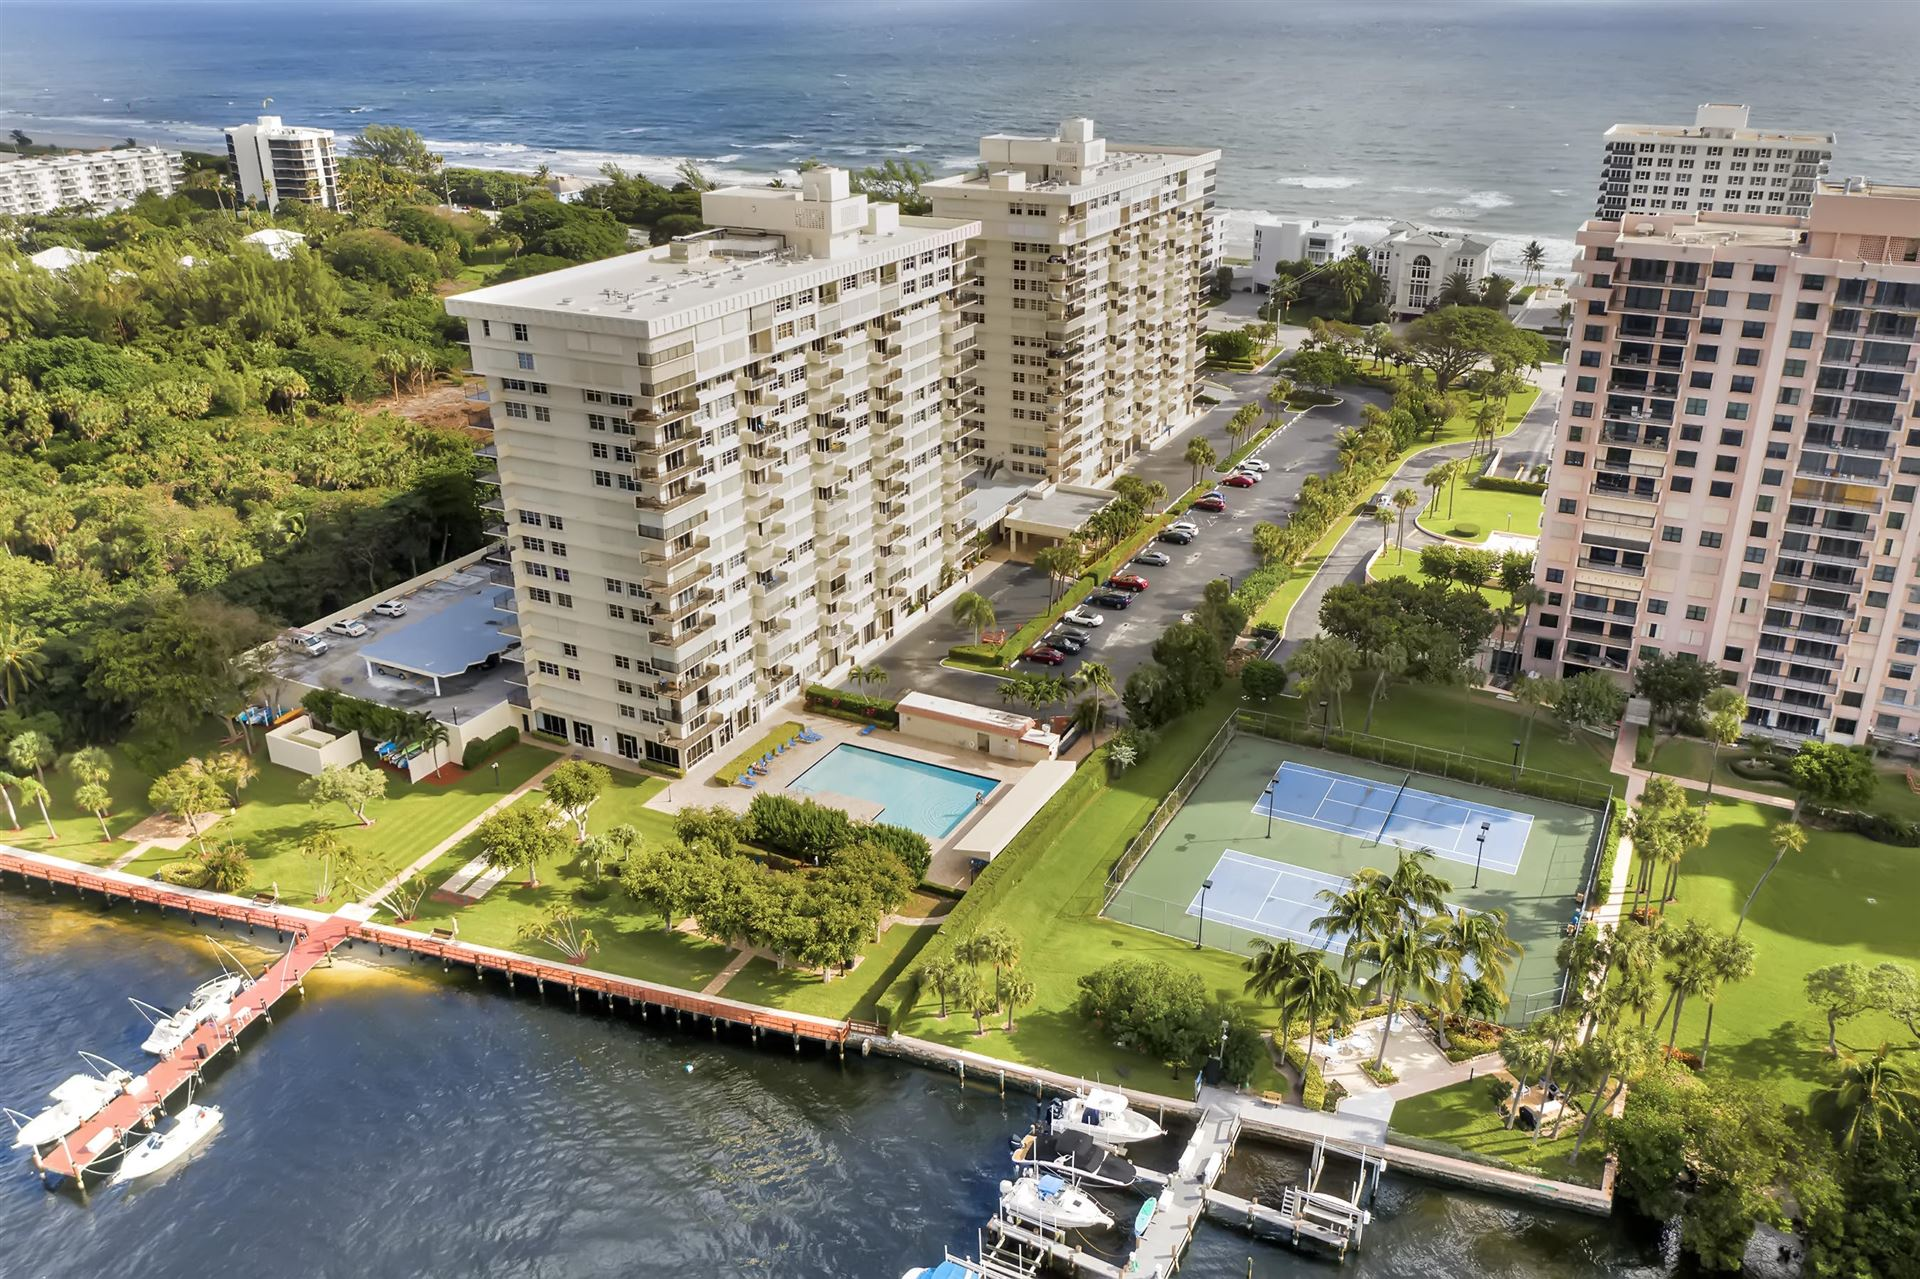 Photo of 2121 N Ocean Boulevard #209e, Boca Raton, FL 33431 (MLS # RX-10674626)